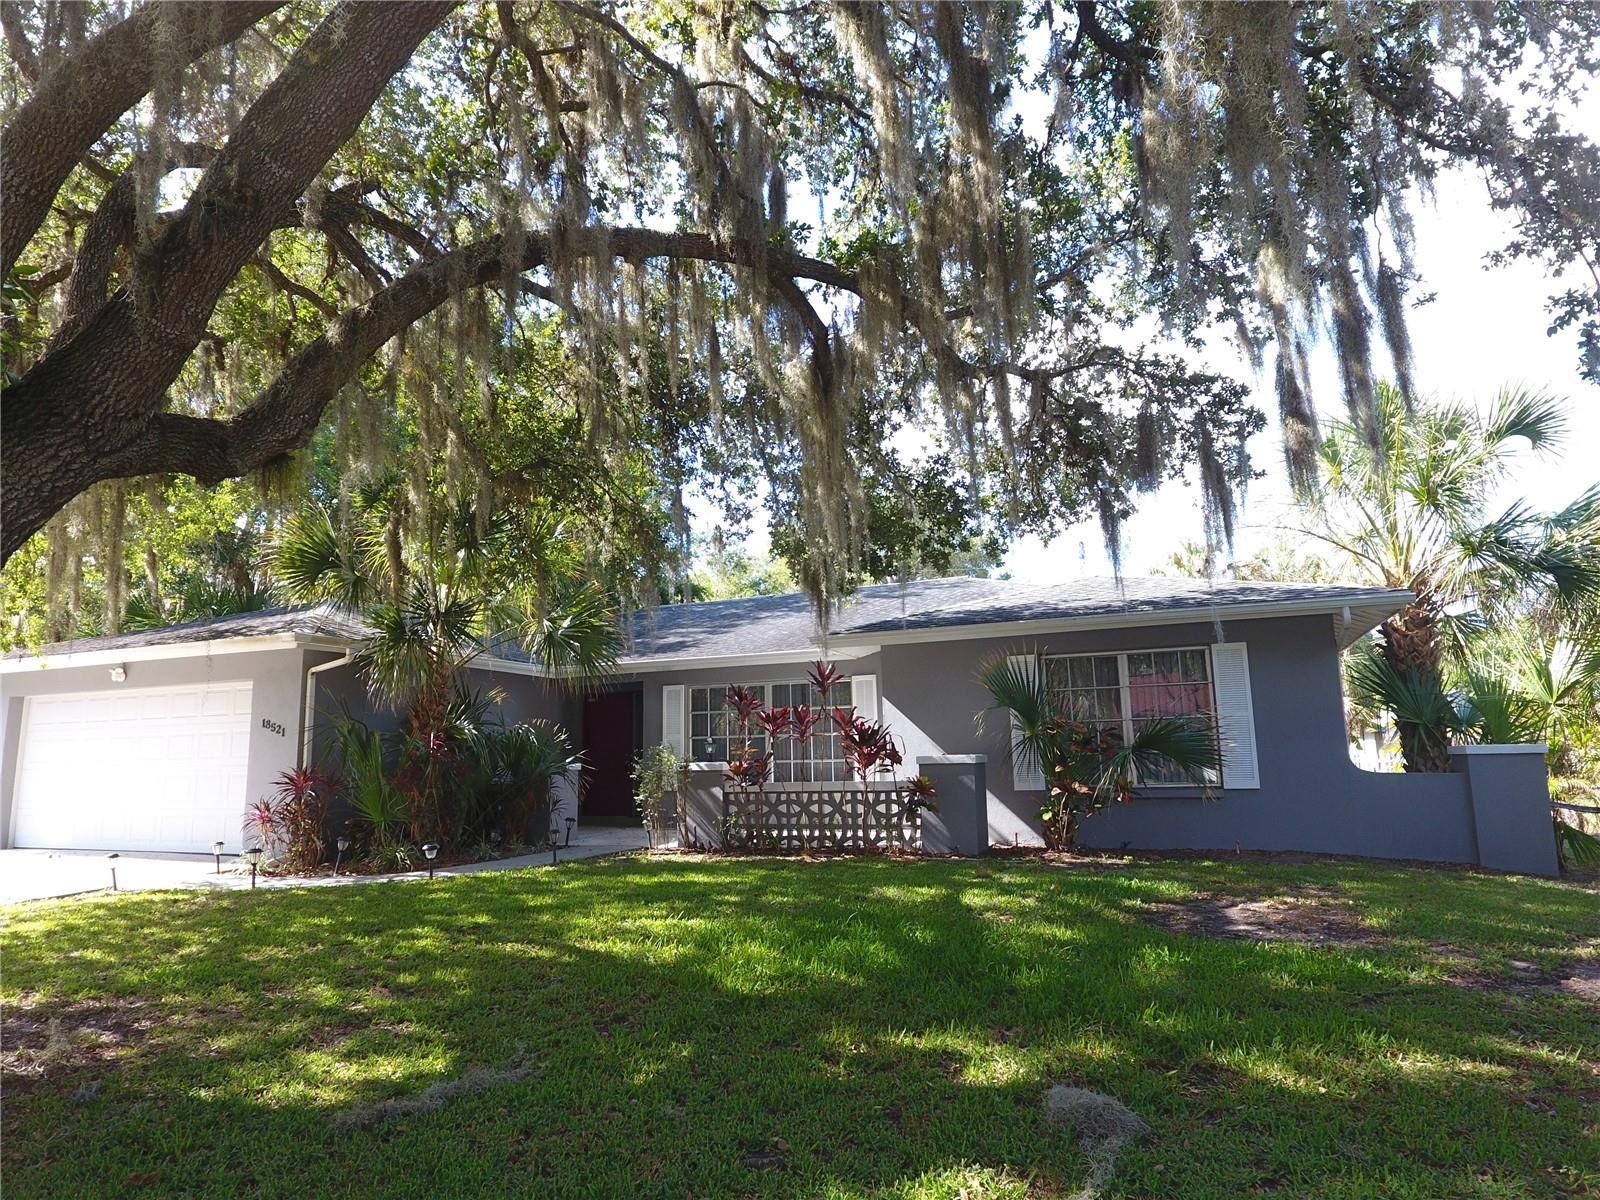 Photo of 18521 GRAND AVENUE, PORT CHARLOTTE, FL 33948 (MLS # C7444621)